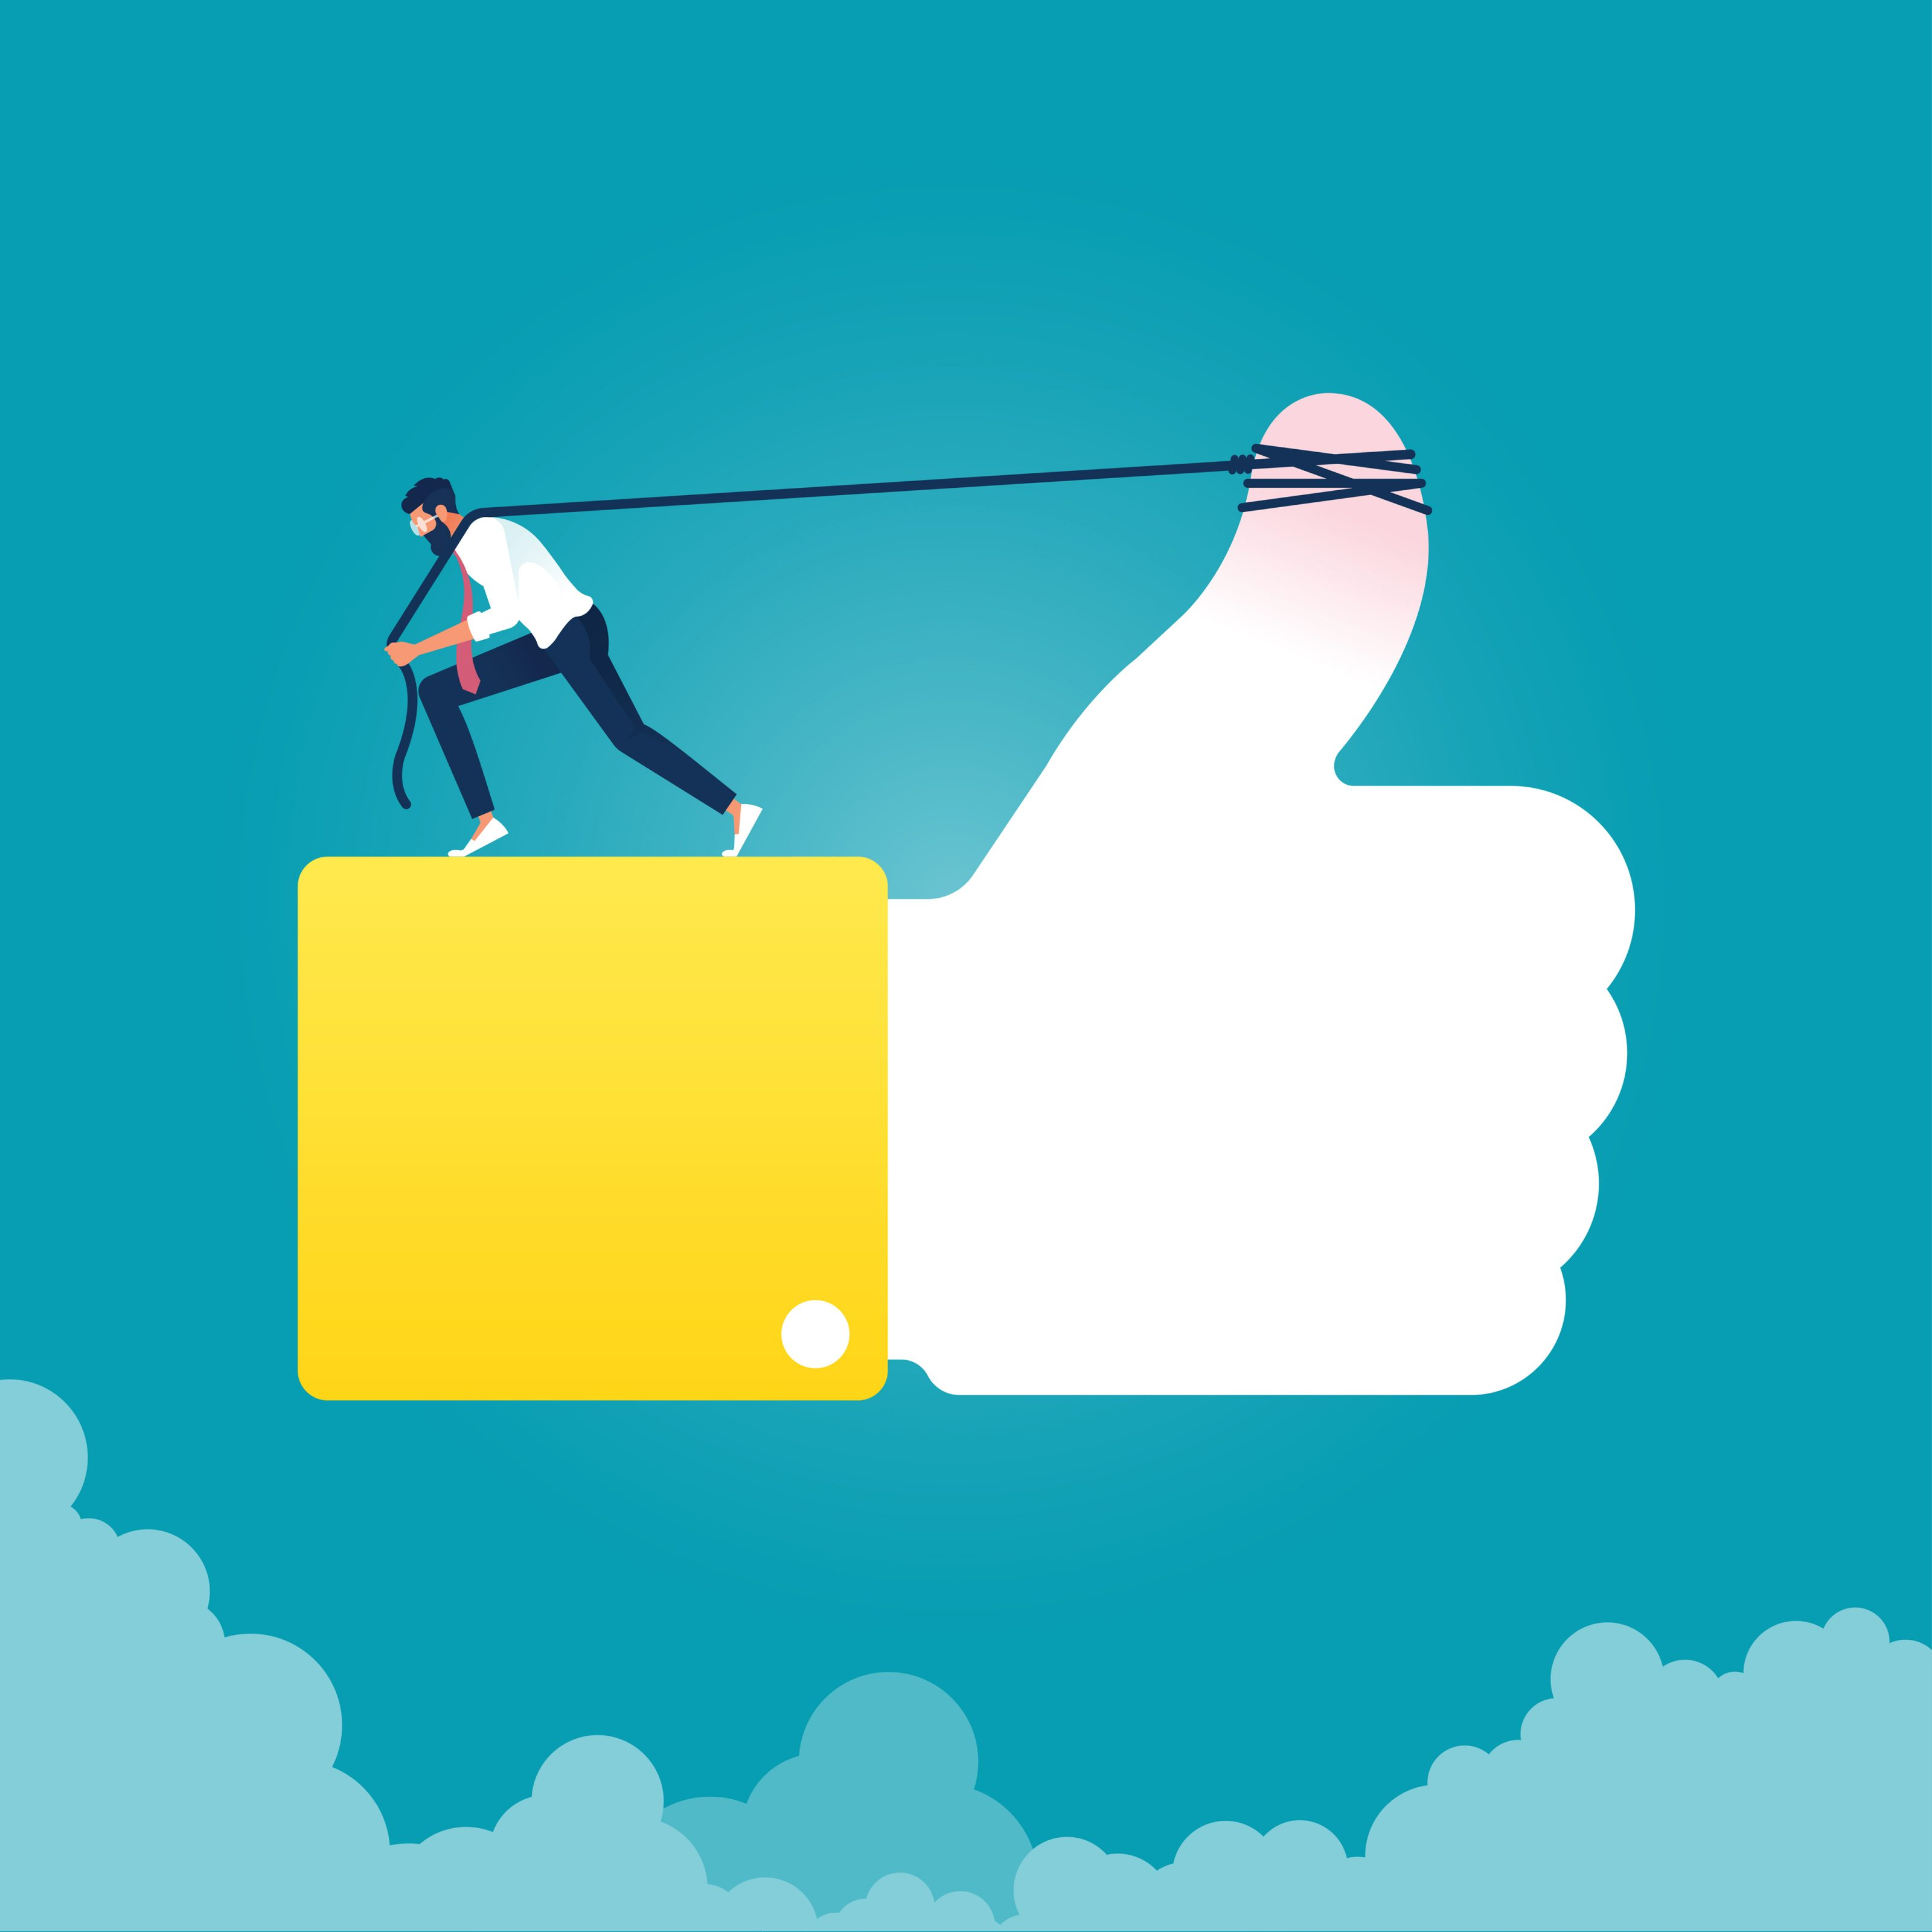 Hard work for positive attitude-Social media marketing concept